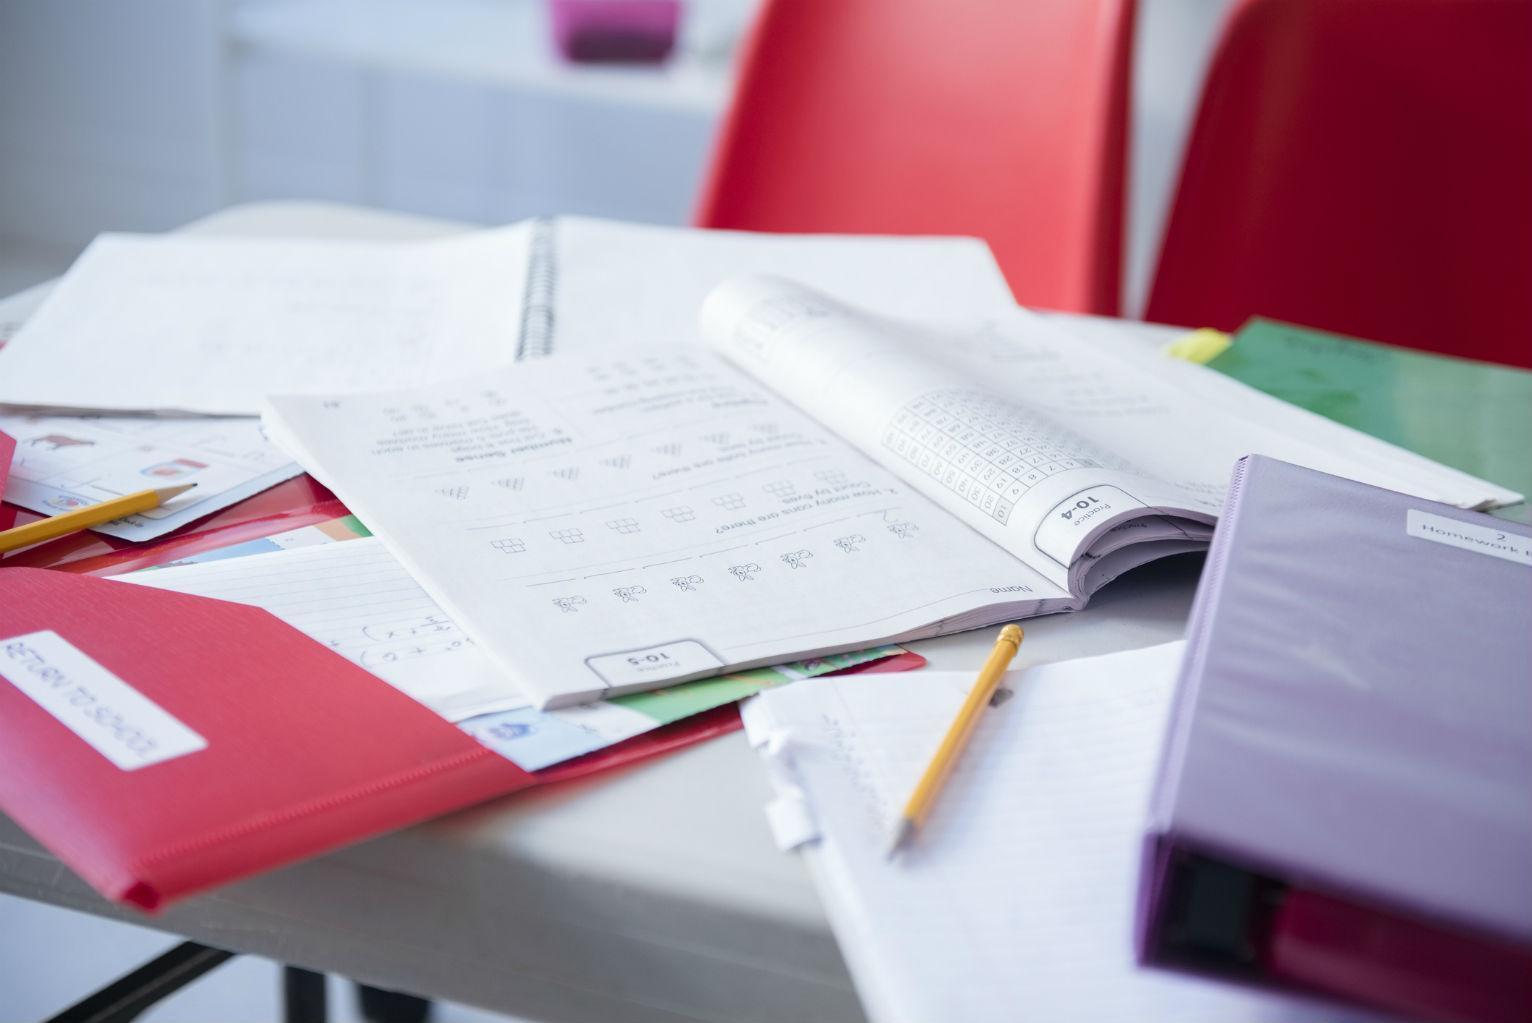 Summer Homework Image